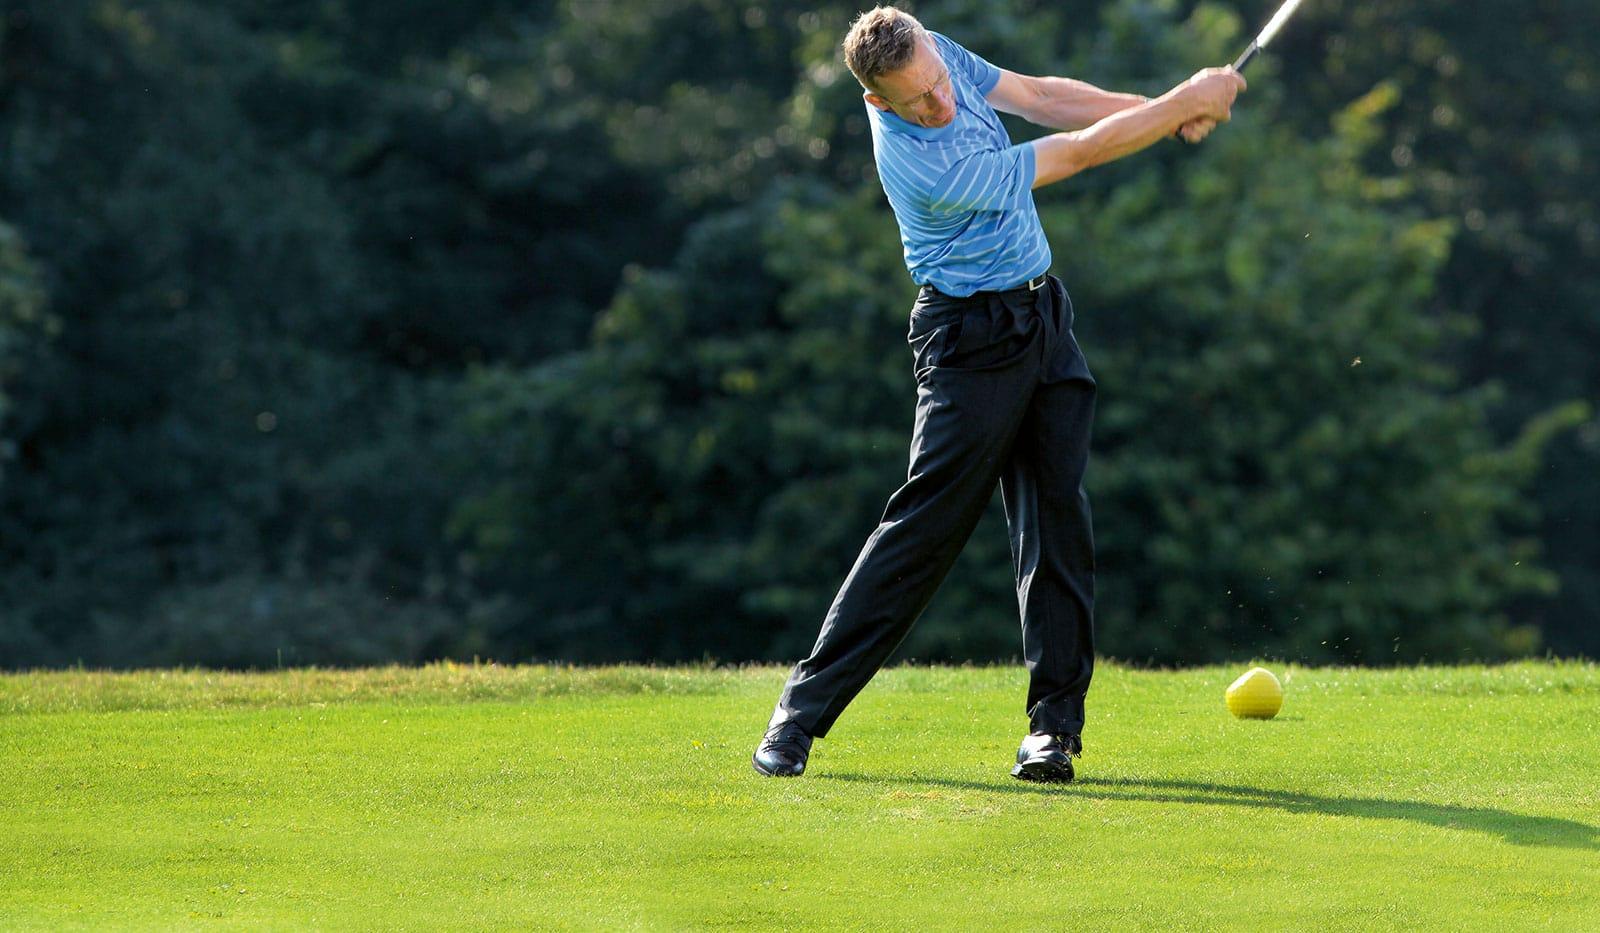 Oliver Heuler auf dem Golfplatz